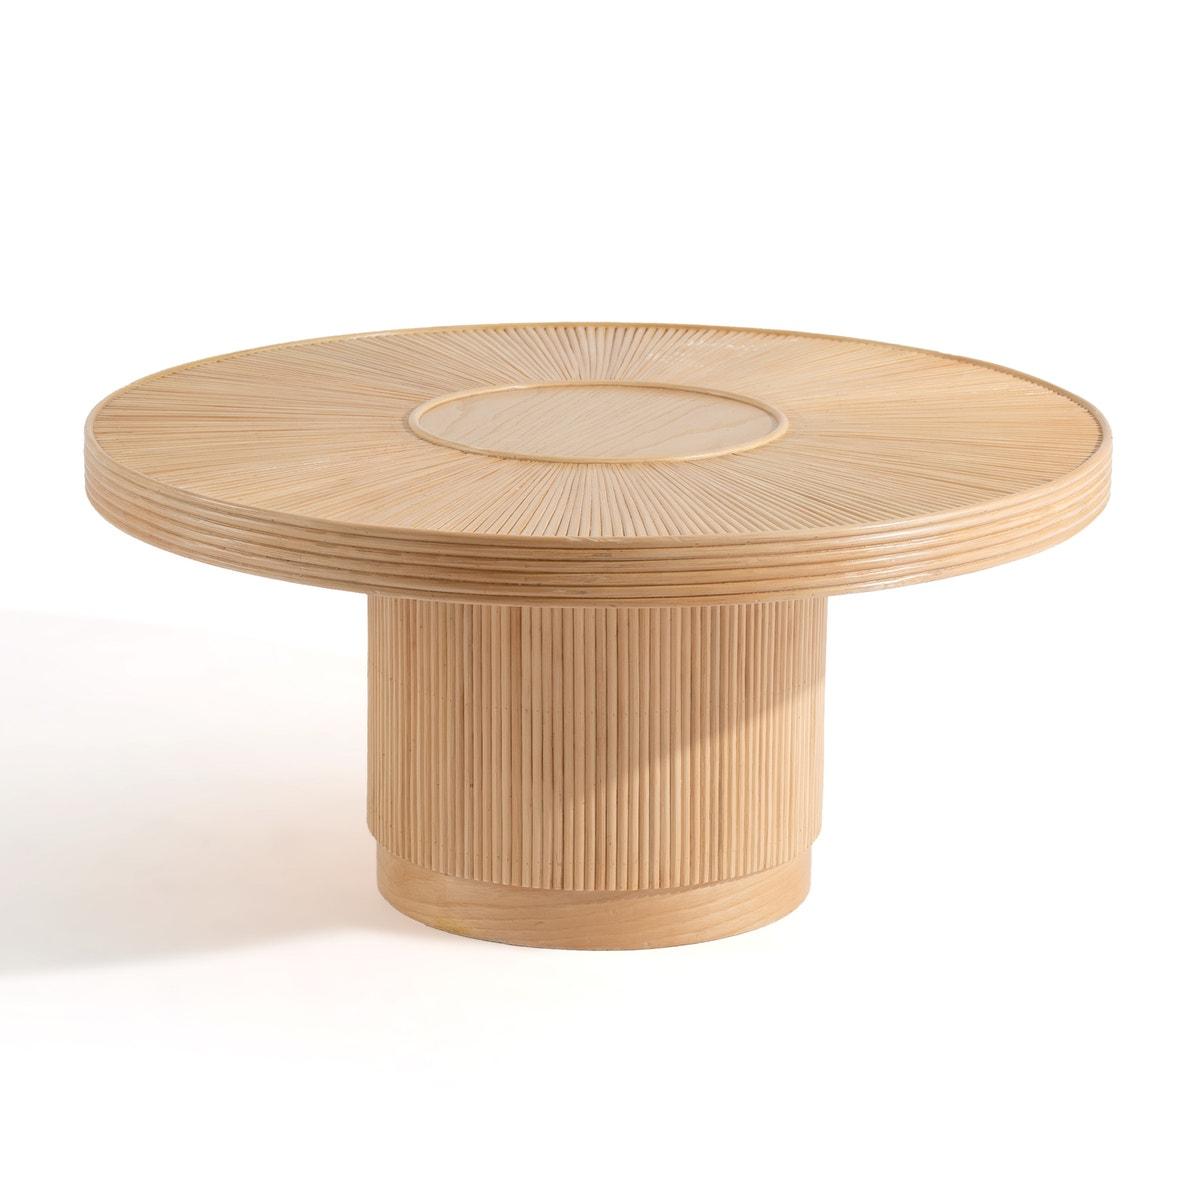 Low table made of rattan cane ø81.5 cm Khaï